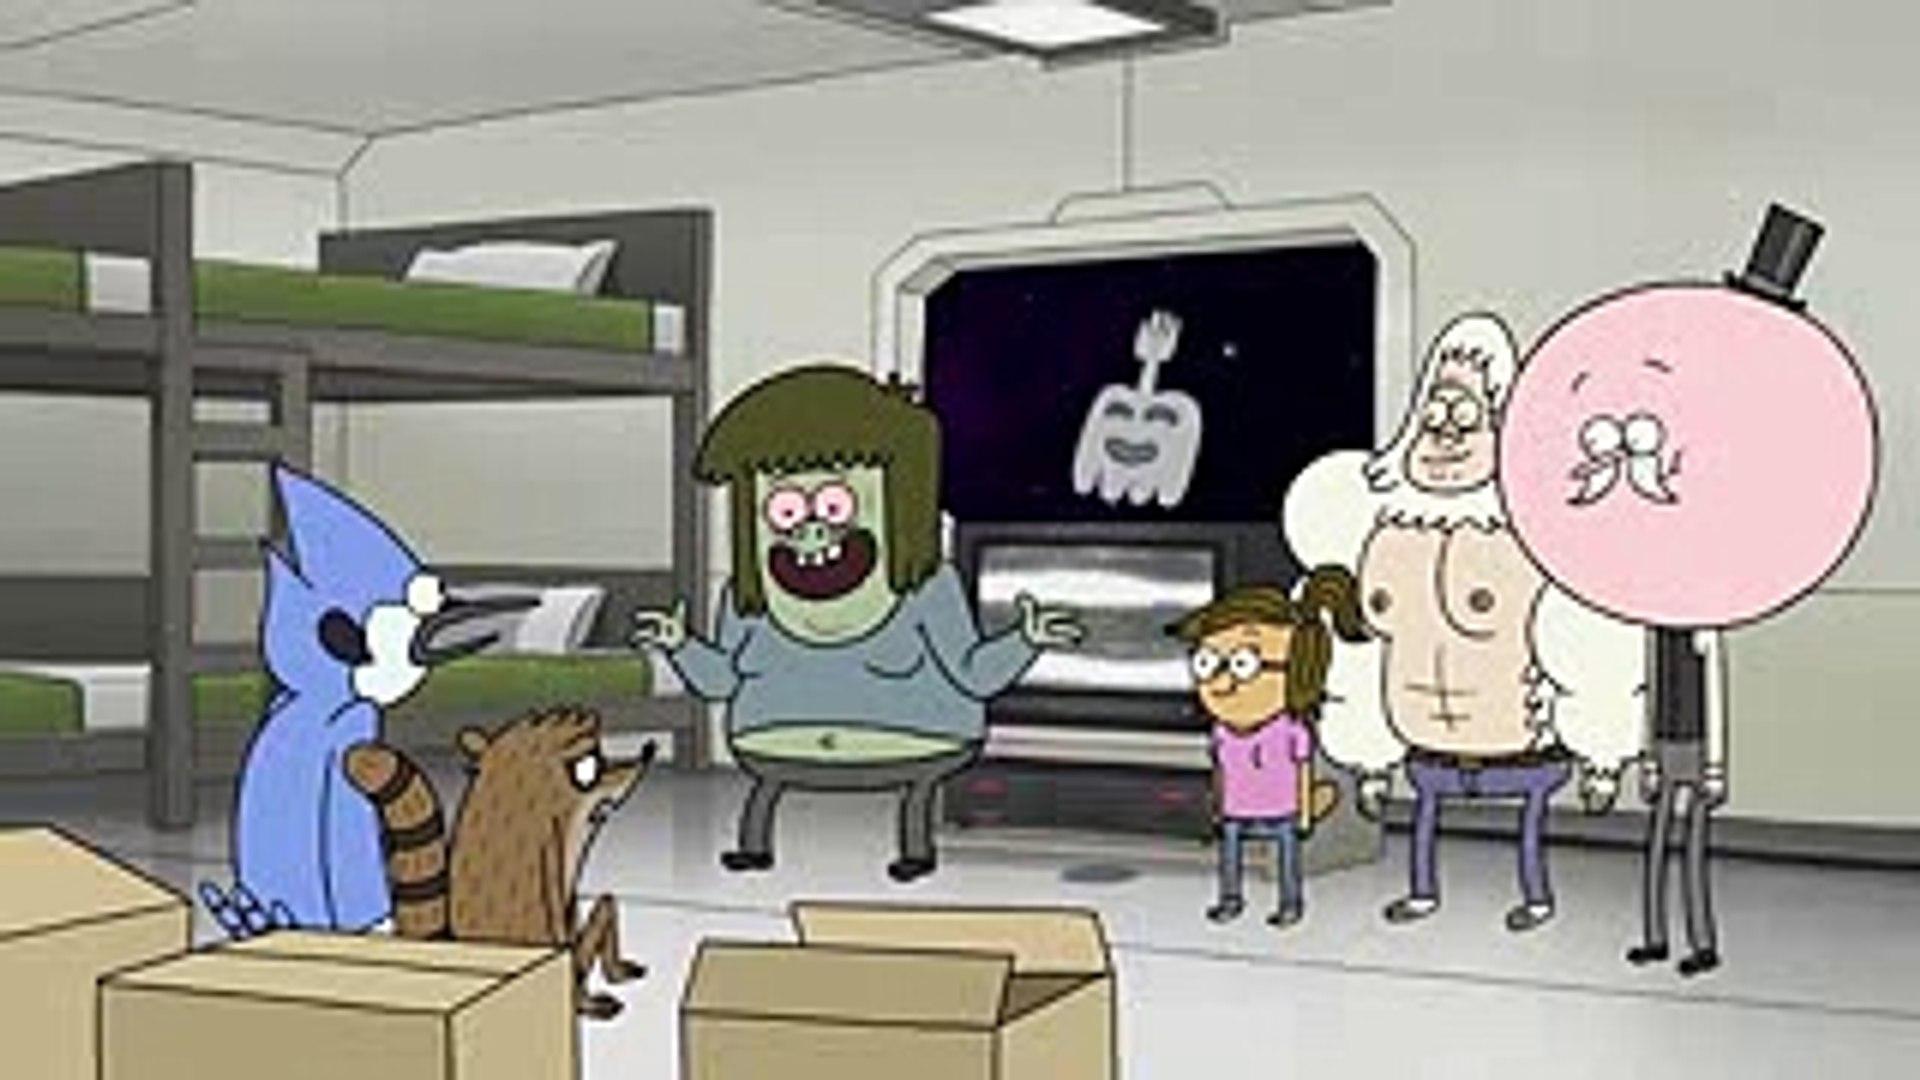 Sürekli Dizi  Dizi Tutkusu  Cartoon Network Türkiye